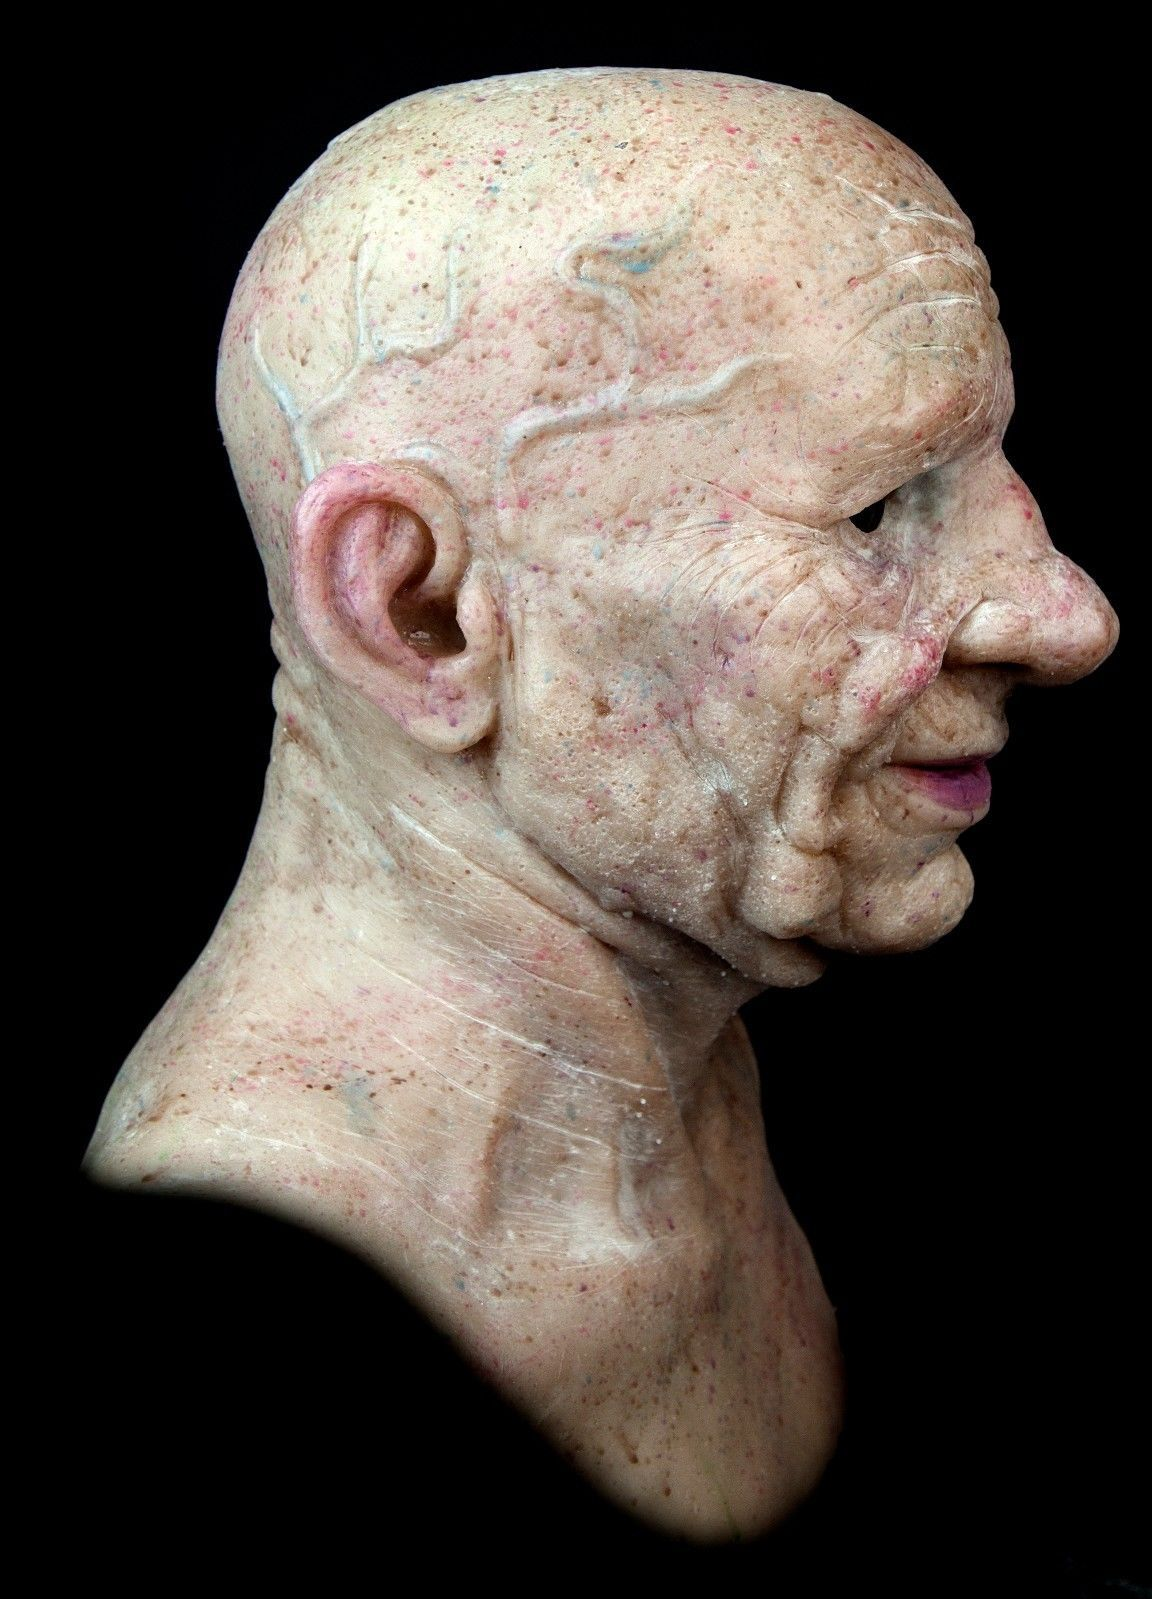 warts on old skin